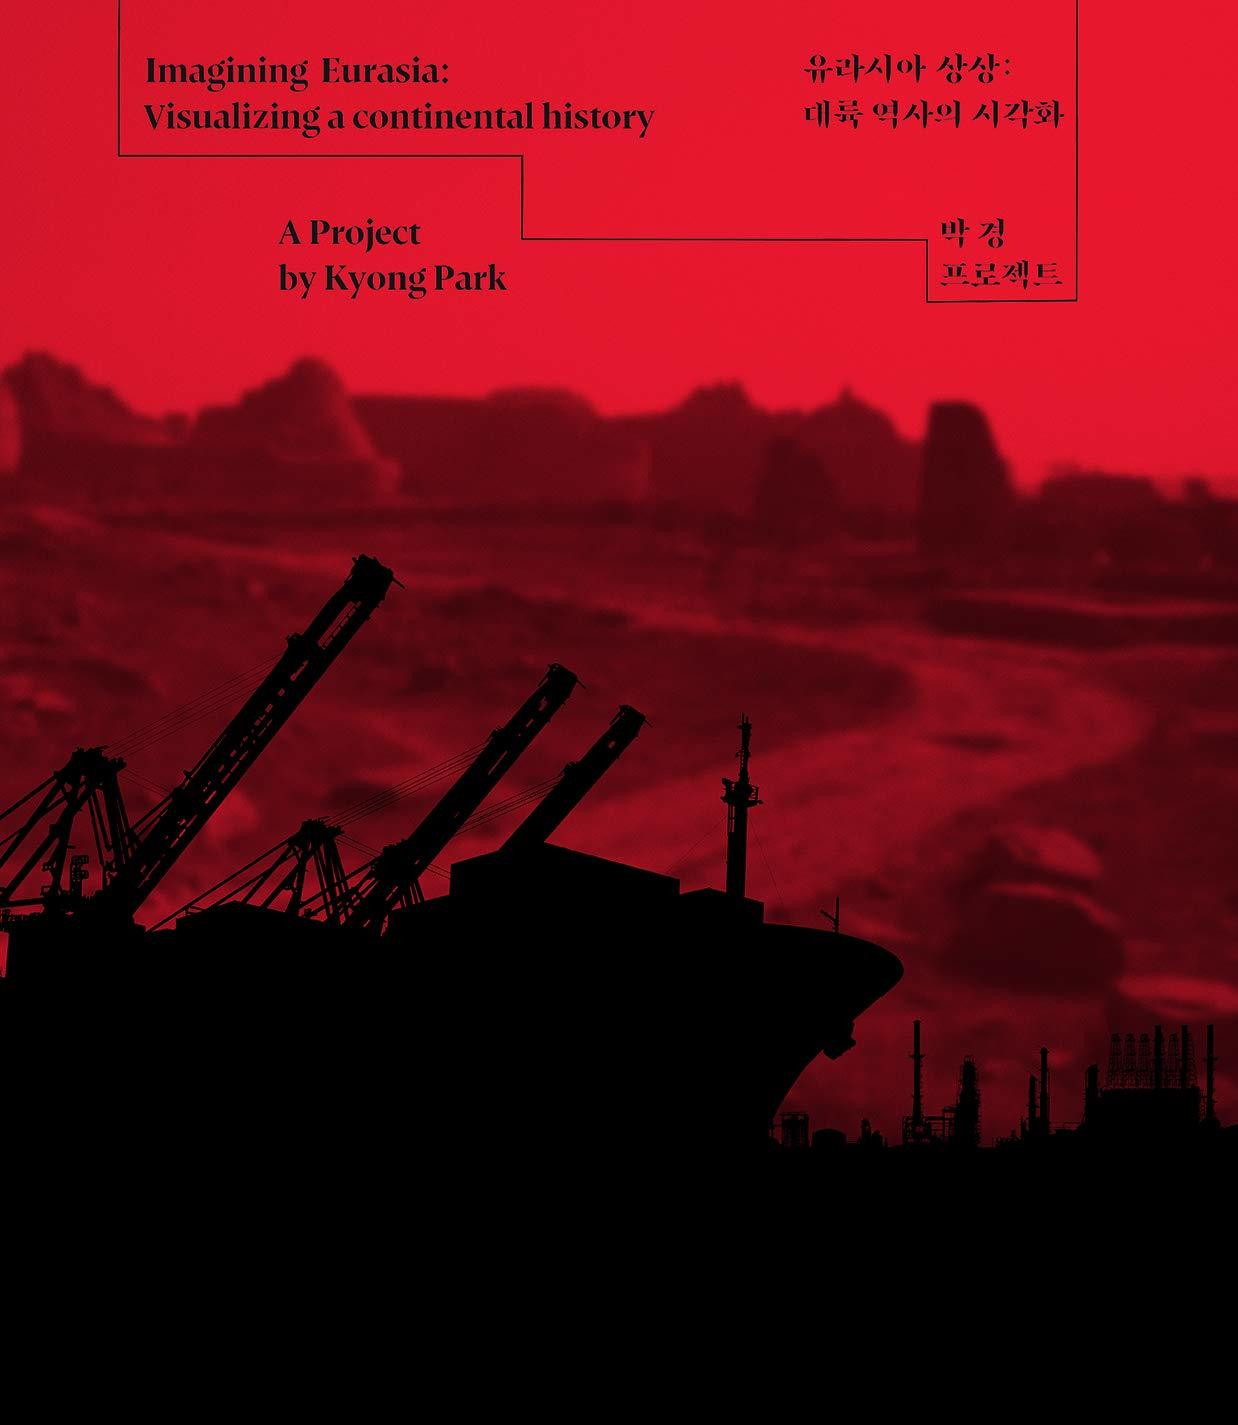 book cover red landscape black machine silhouettes